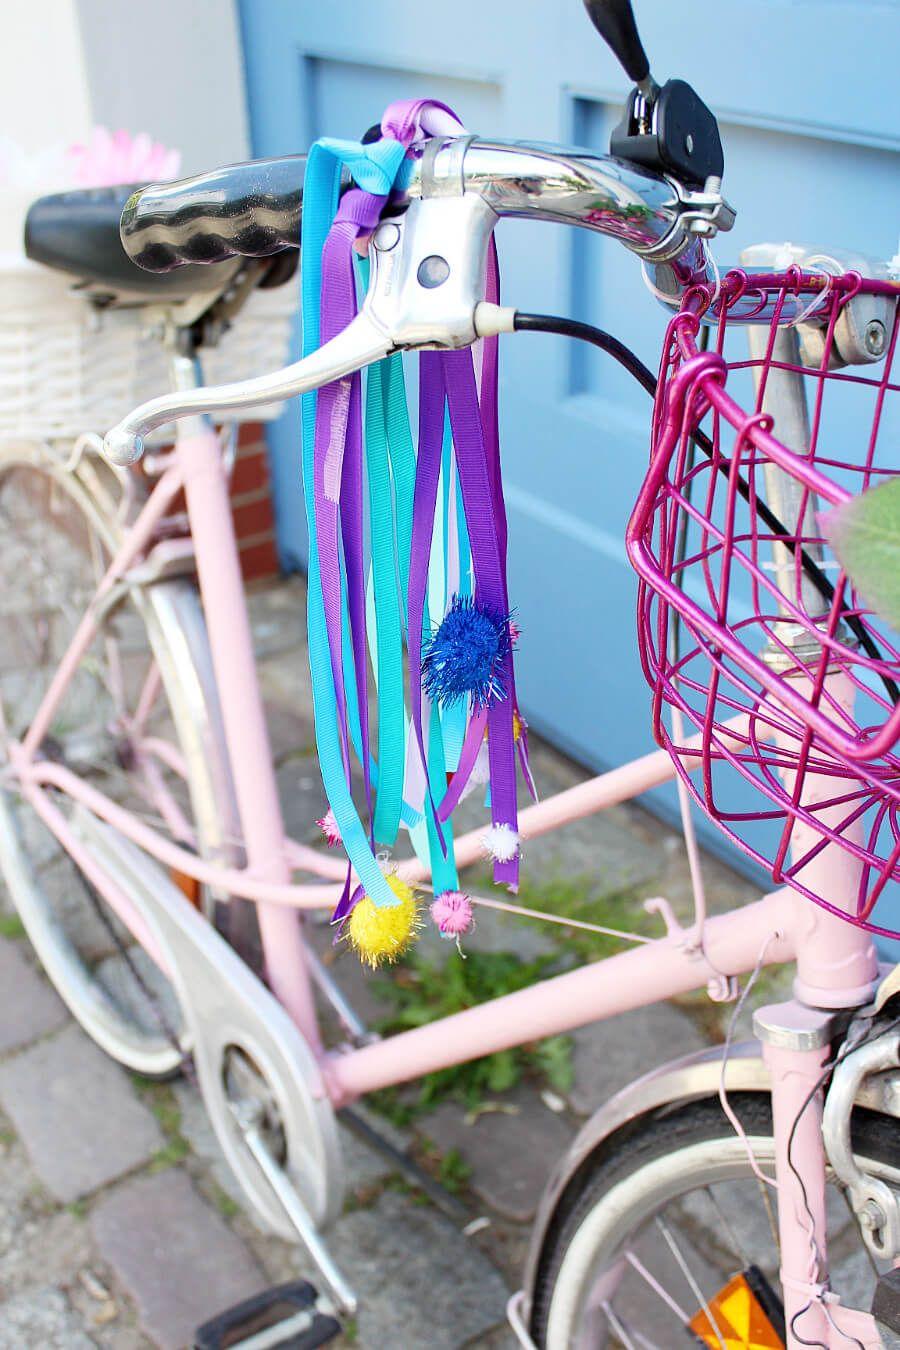 Diy Fahrrad Upcyceln 4 Geniale Ideen Um Dein Fahrrad Aufzupimpen